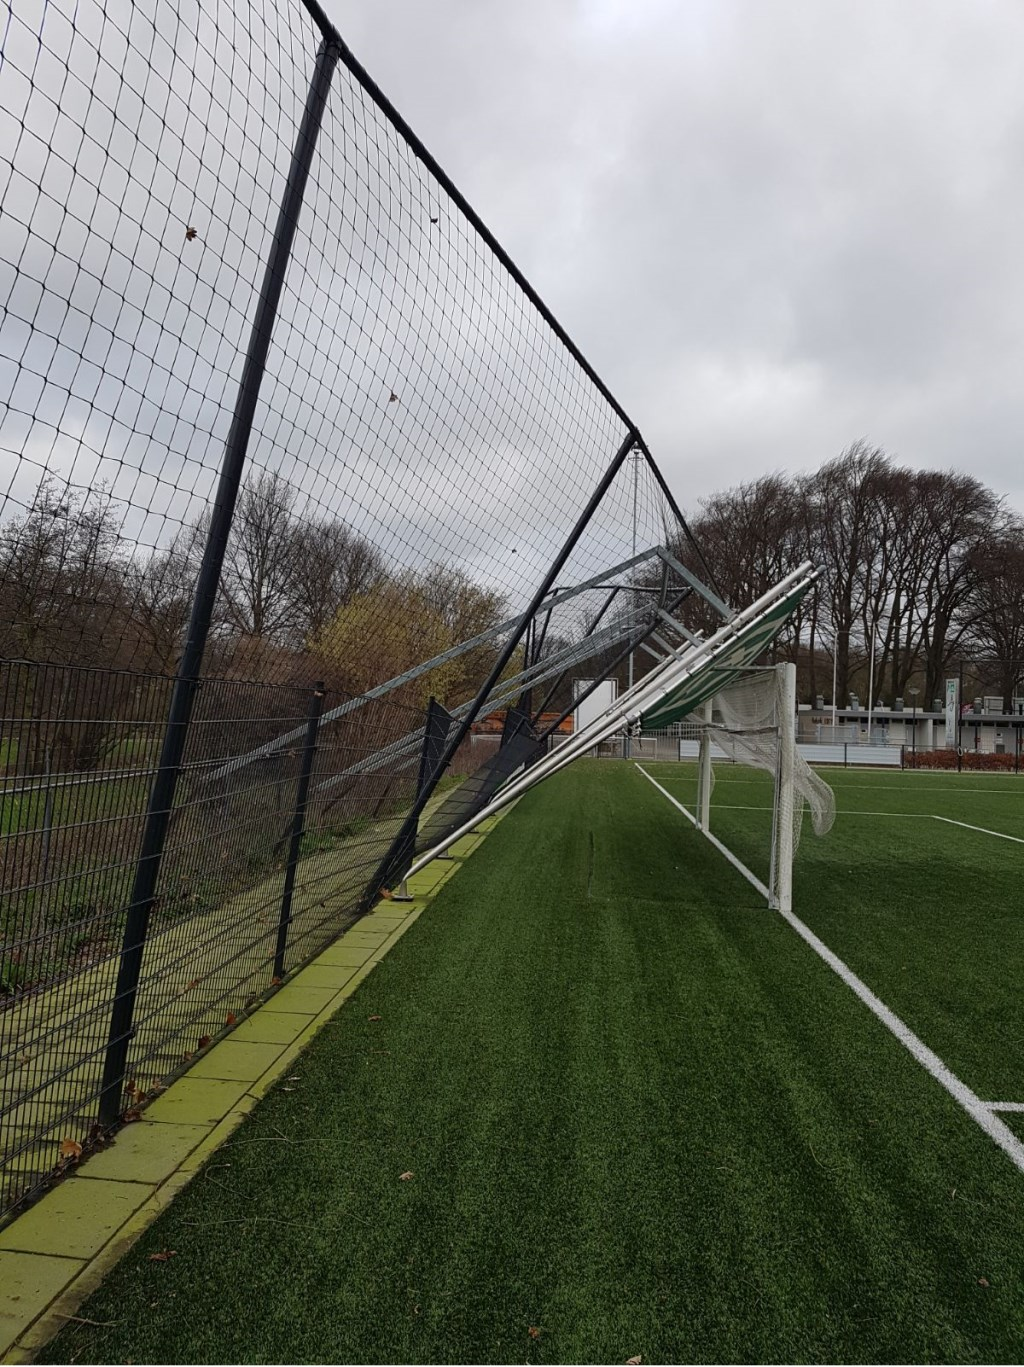 Sportpark UDI'19/CSU Foto: DeMooiUdenKrant © MooiUden